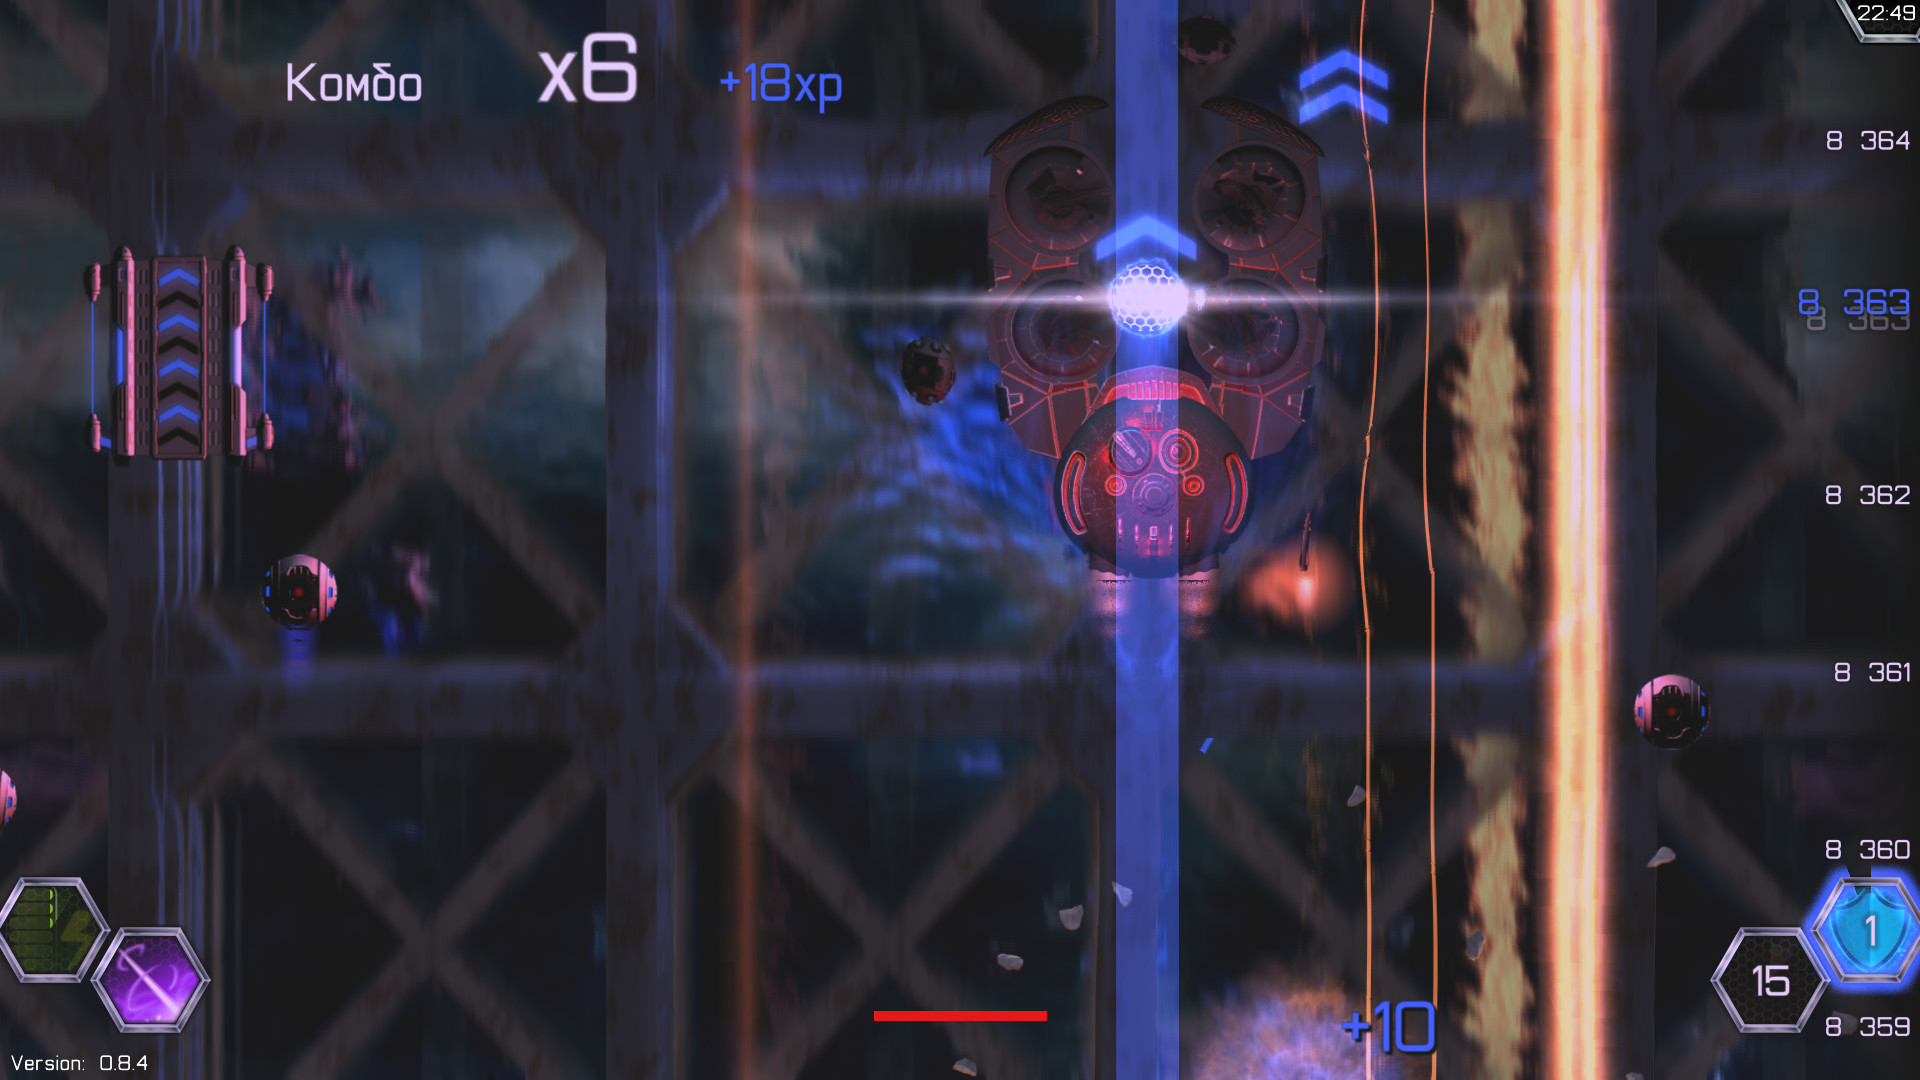 Blast-off screenshot